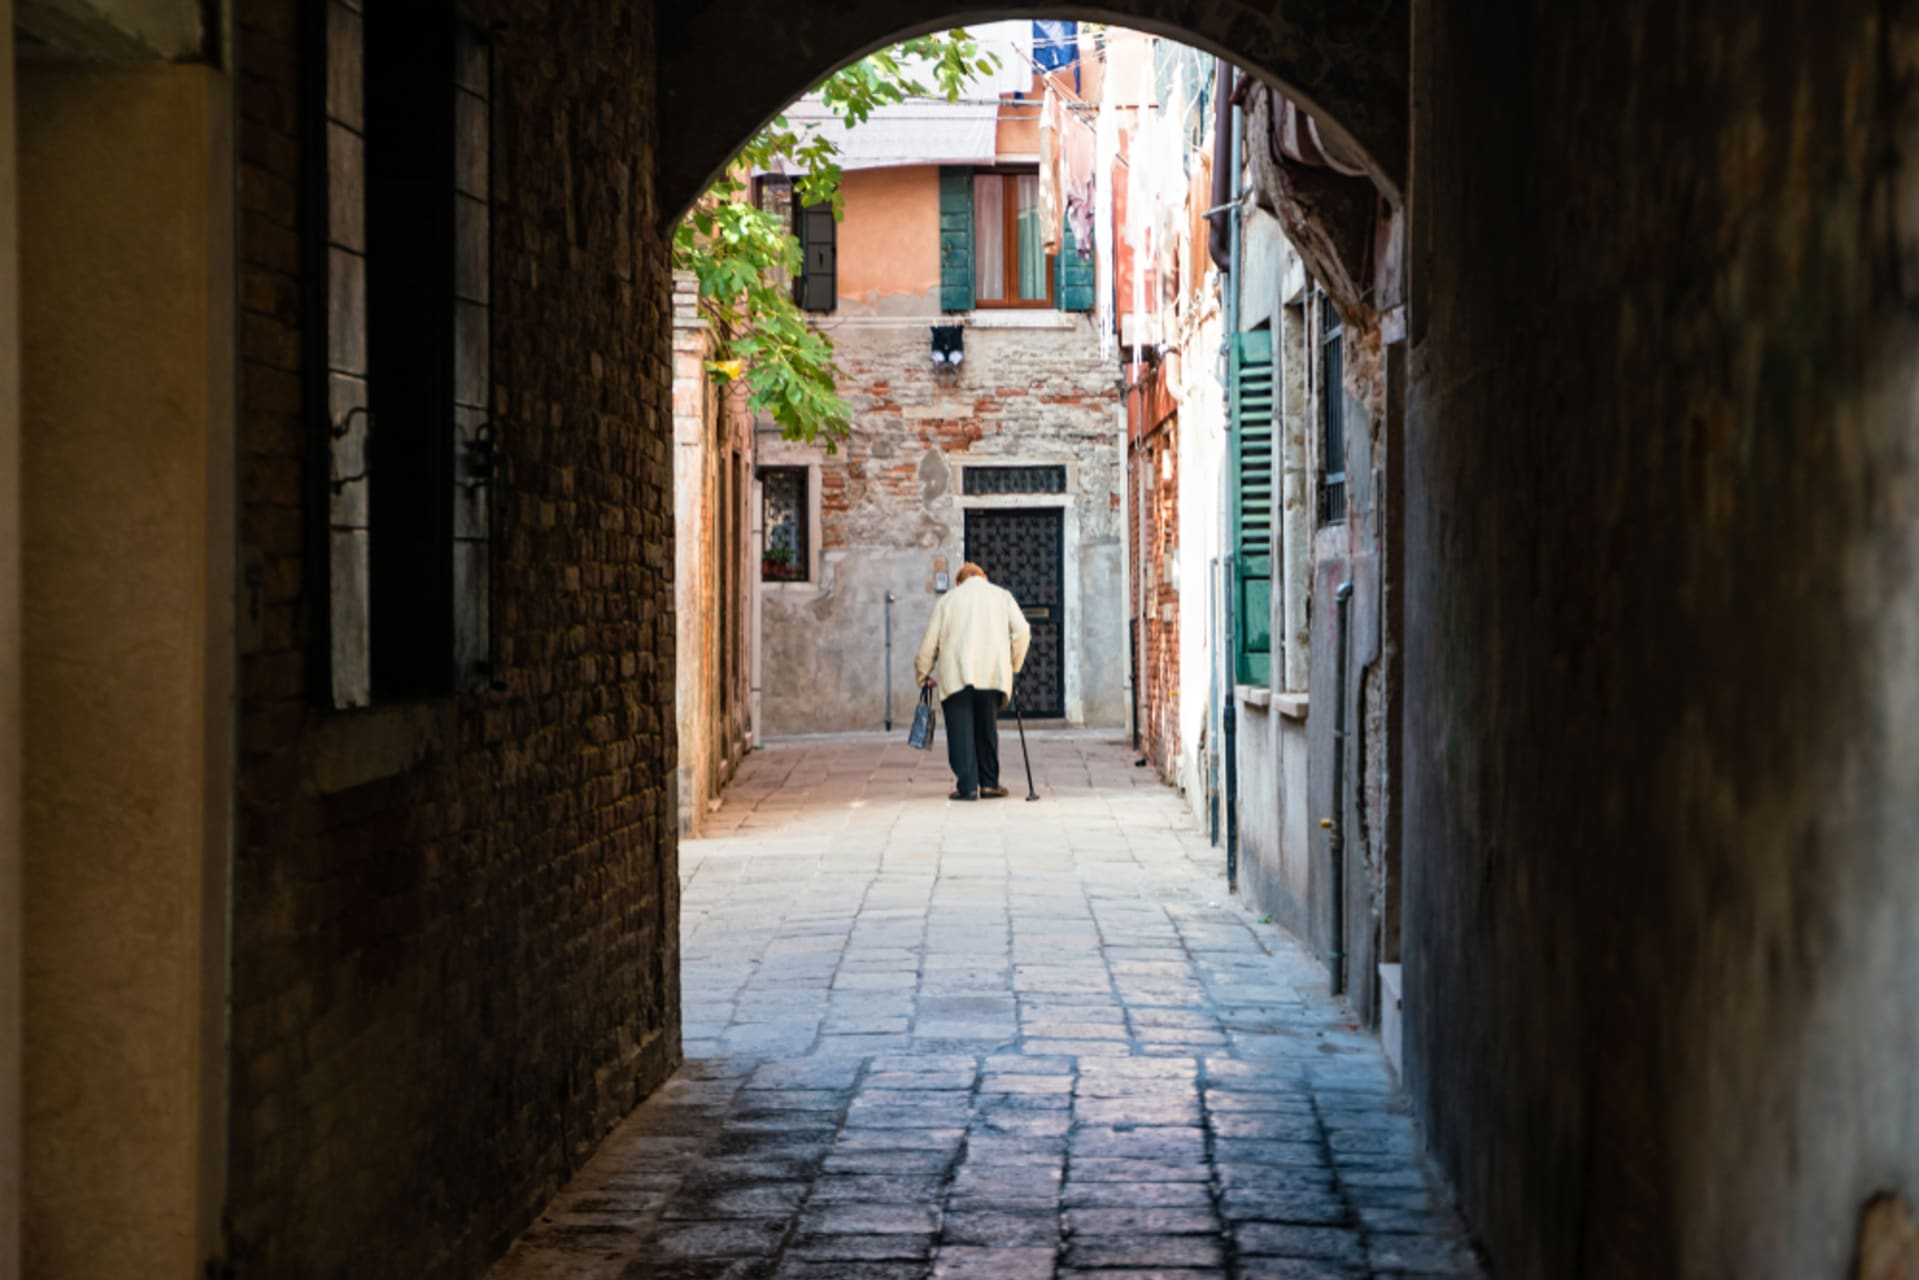 Venice - Venice Castello district -  the untouched Venice